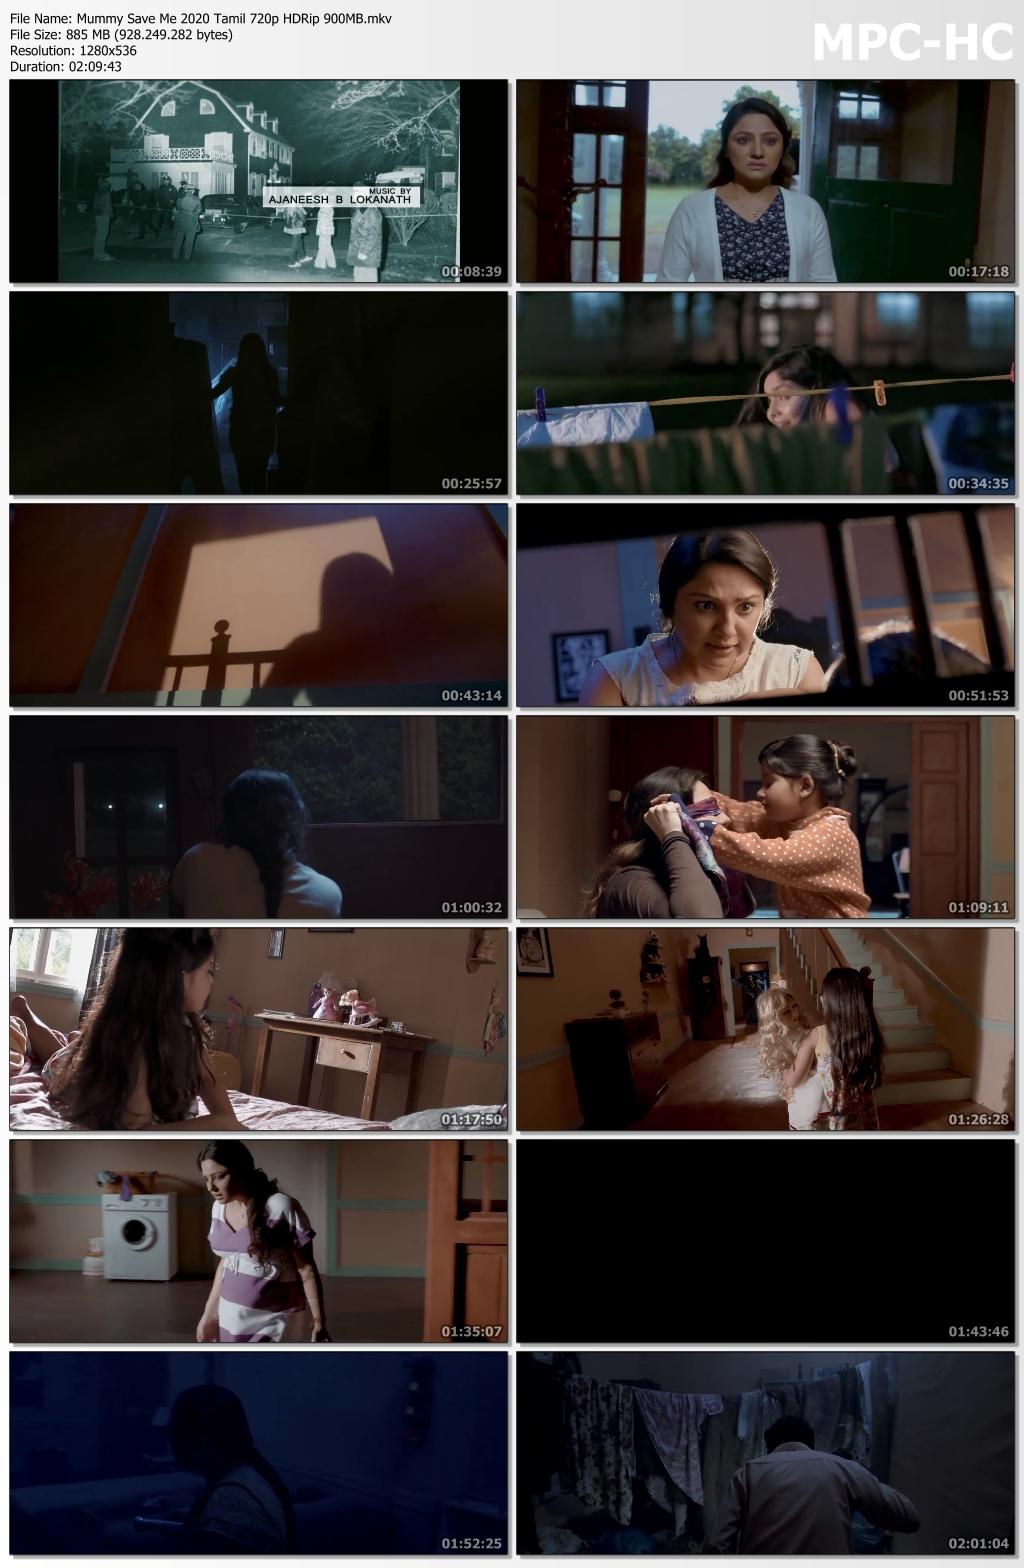 Mummy-Save-Me-2020-Tamil-720p-HDRip-900-MB-mkv-thumbs